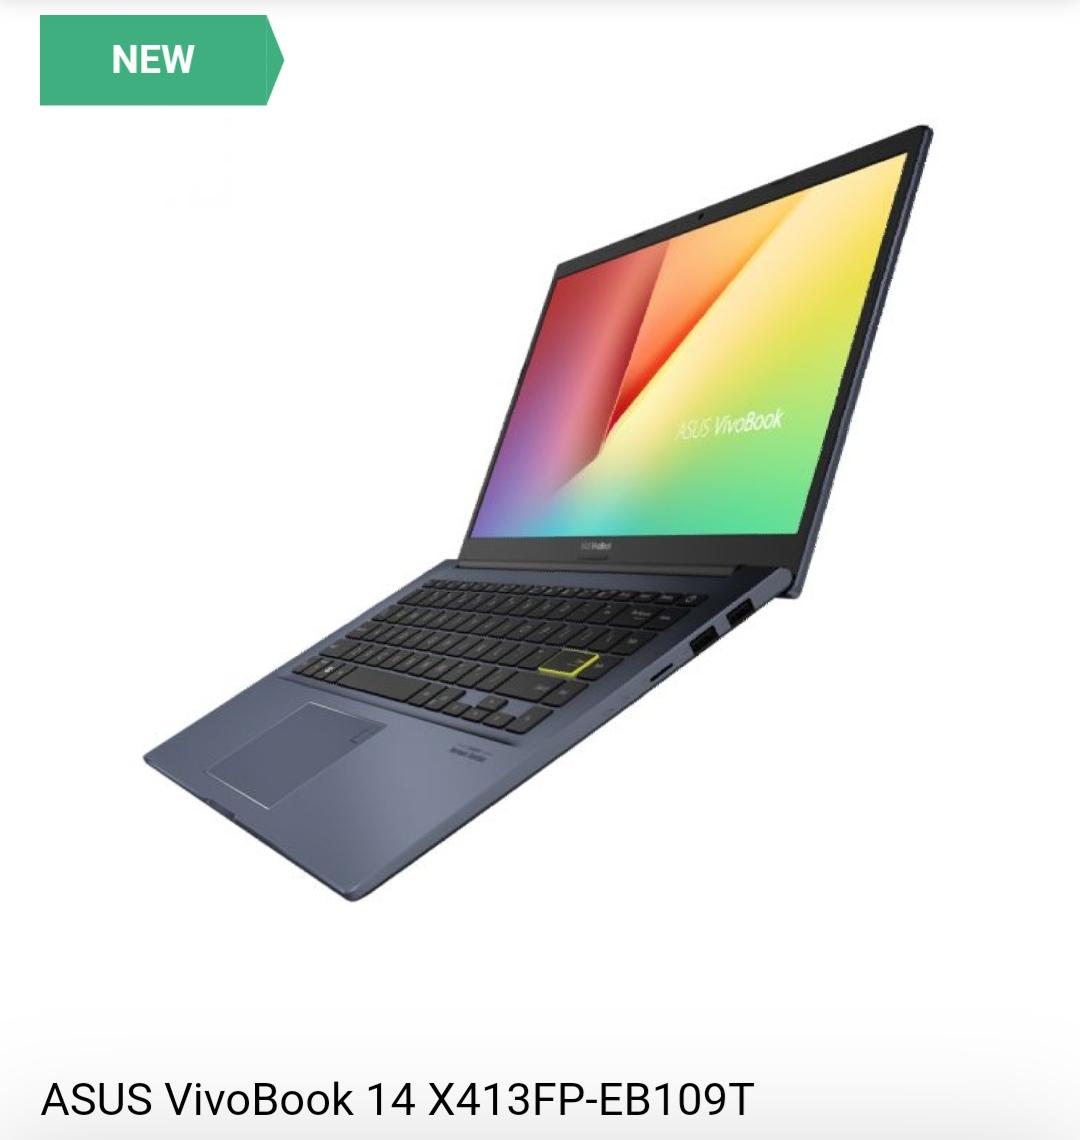 Asus VivoBook 14x413FP-EB109T